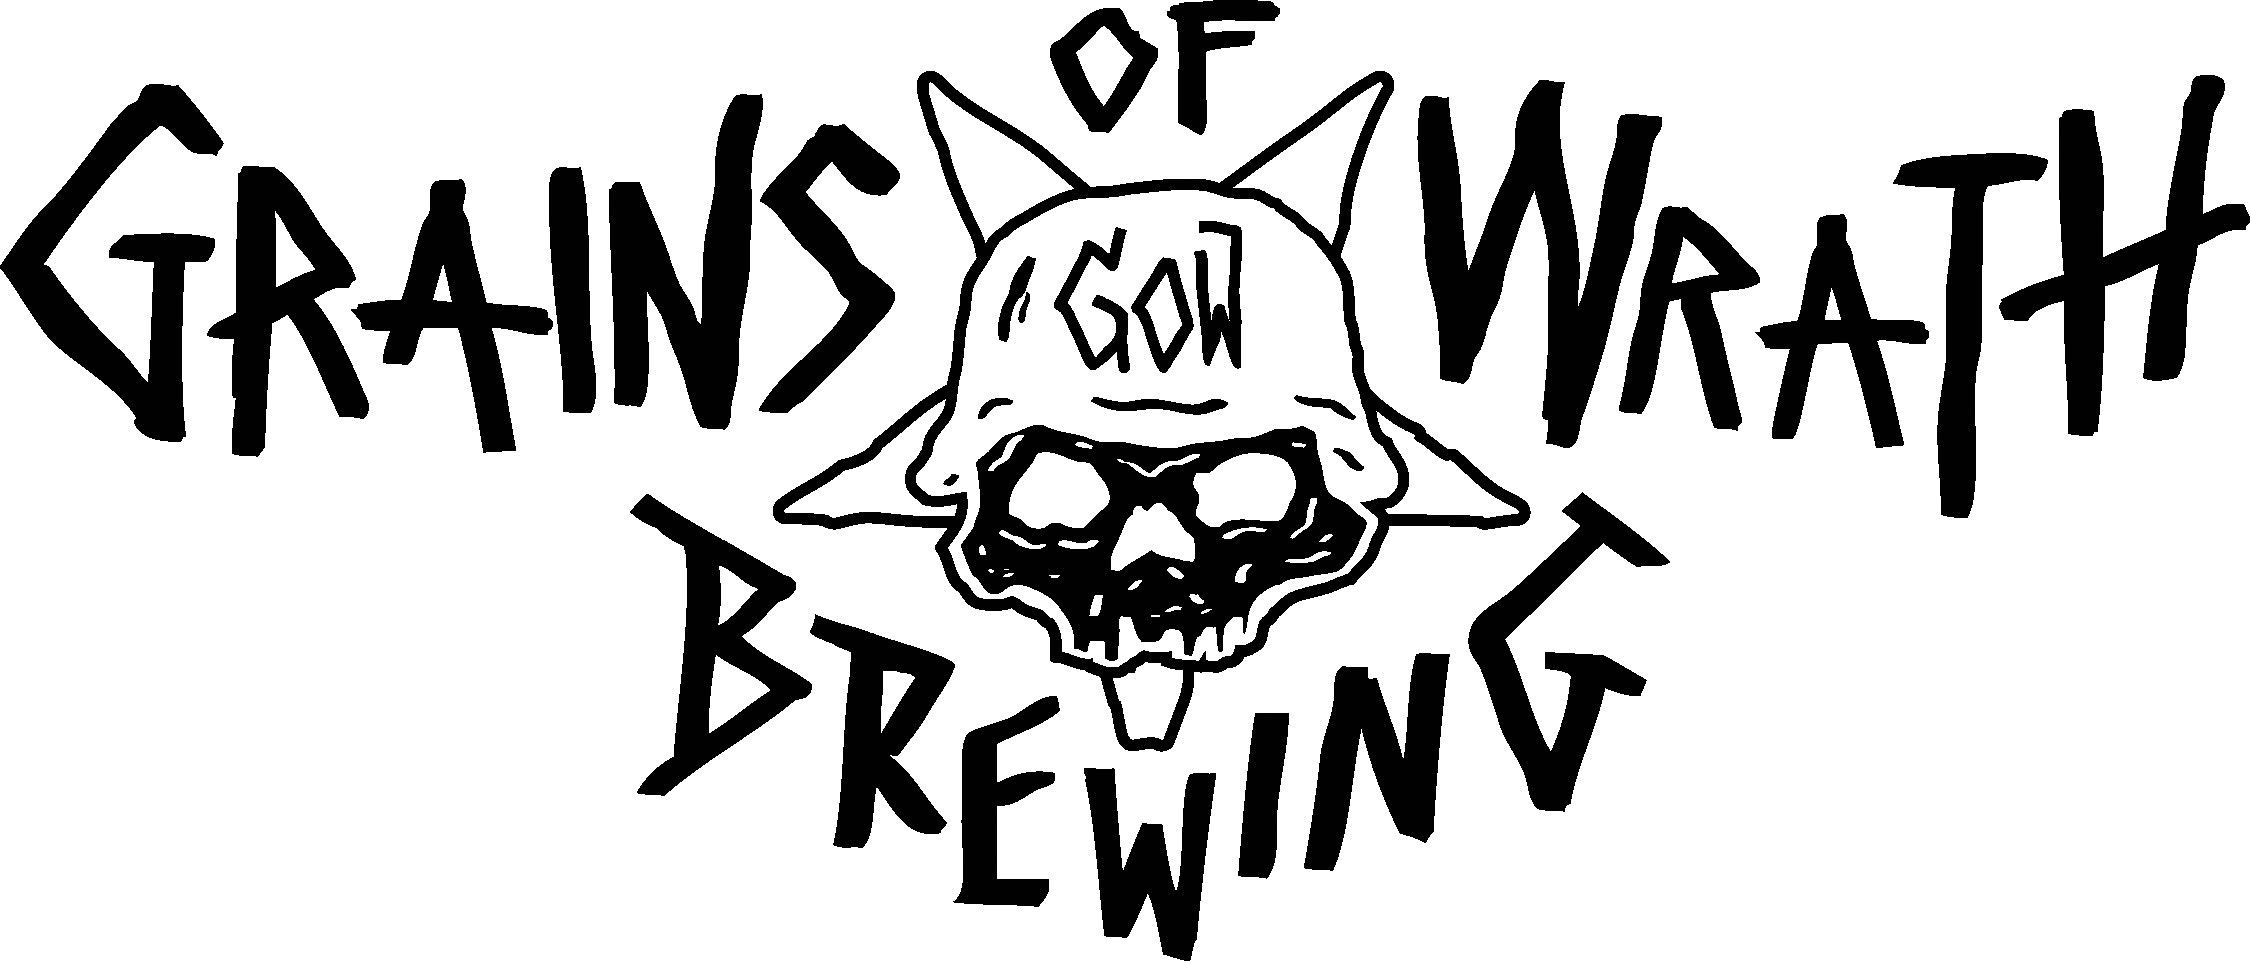 Grains-of-Wrath-Brewing-Logo.jpg